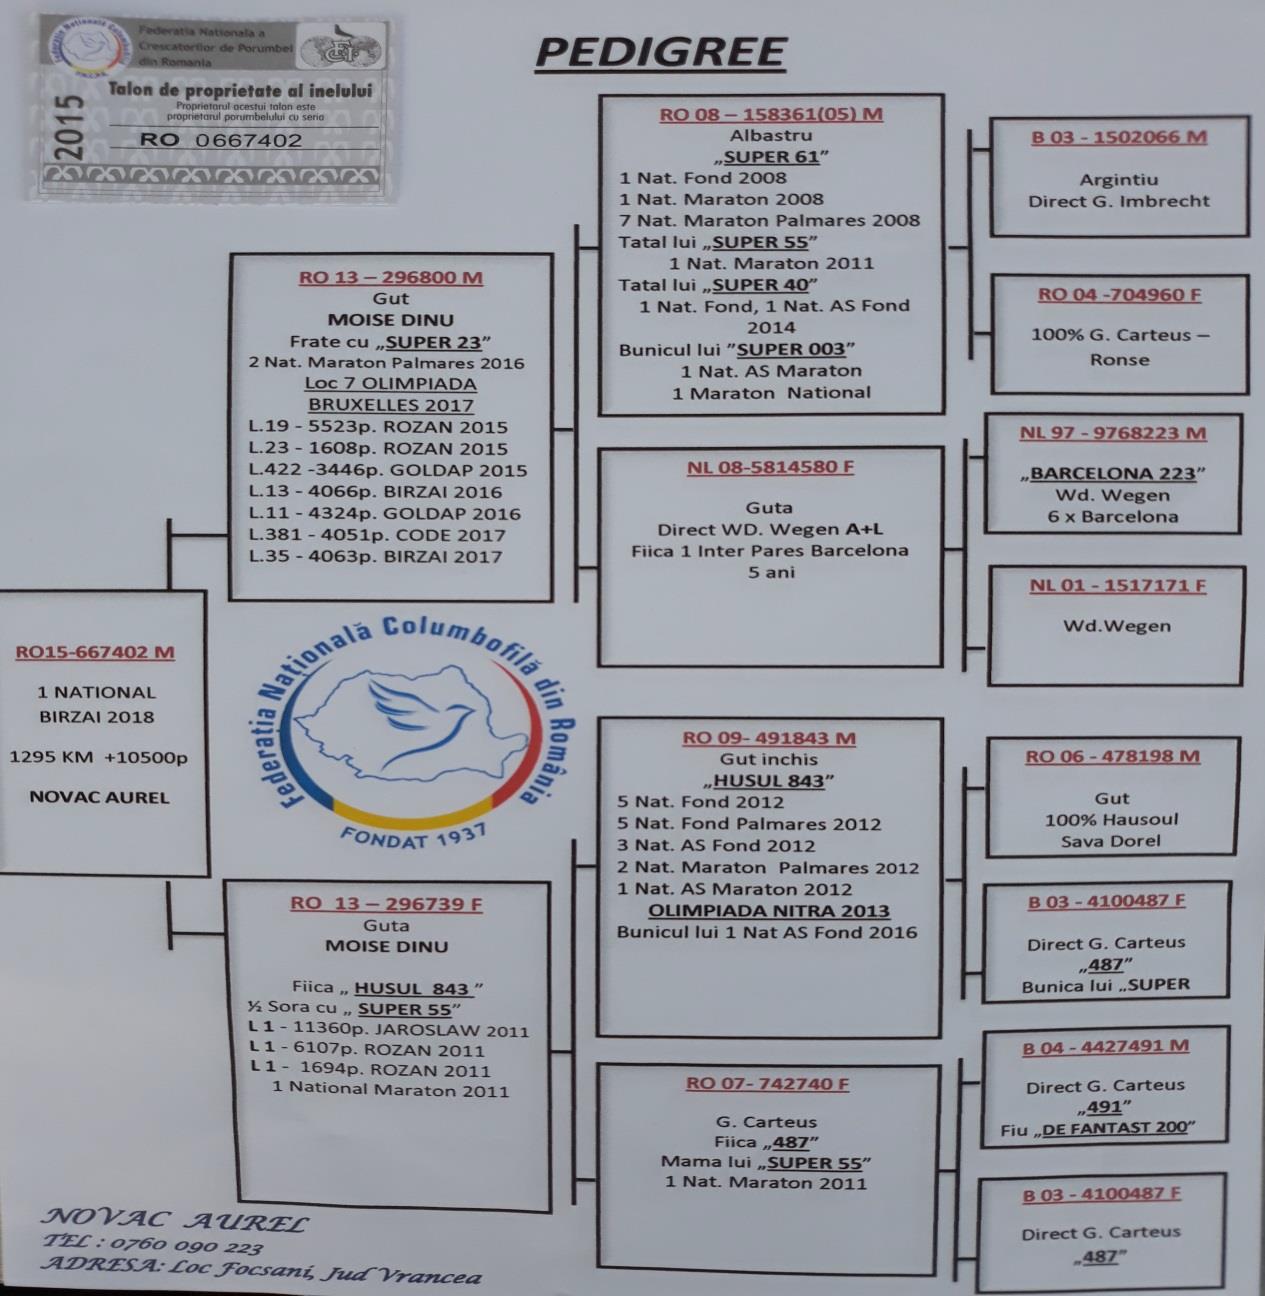 pedigree-aurel-novac